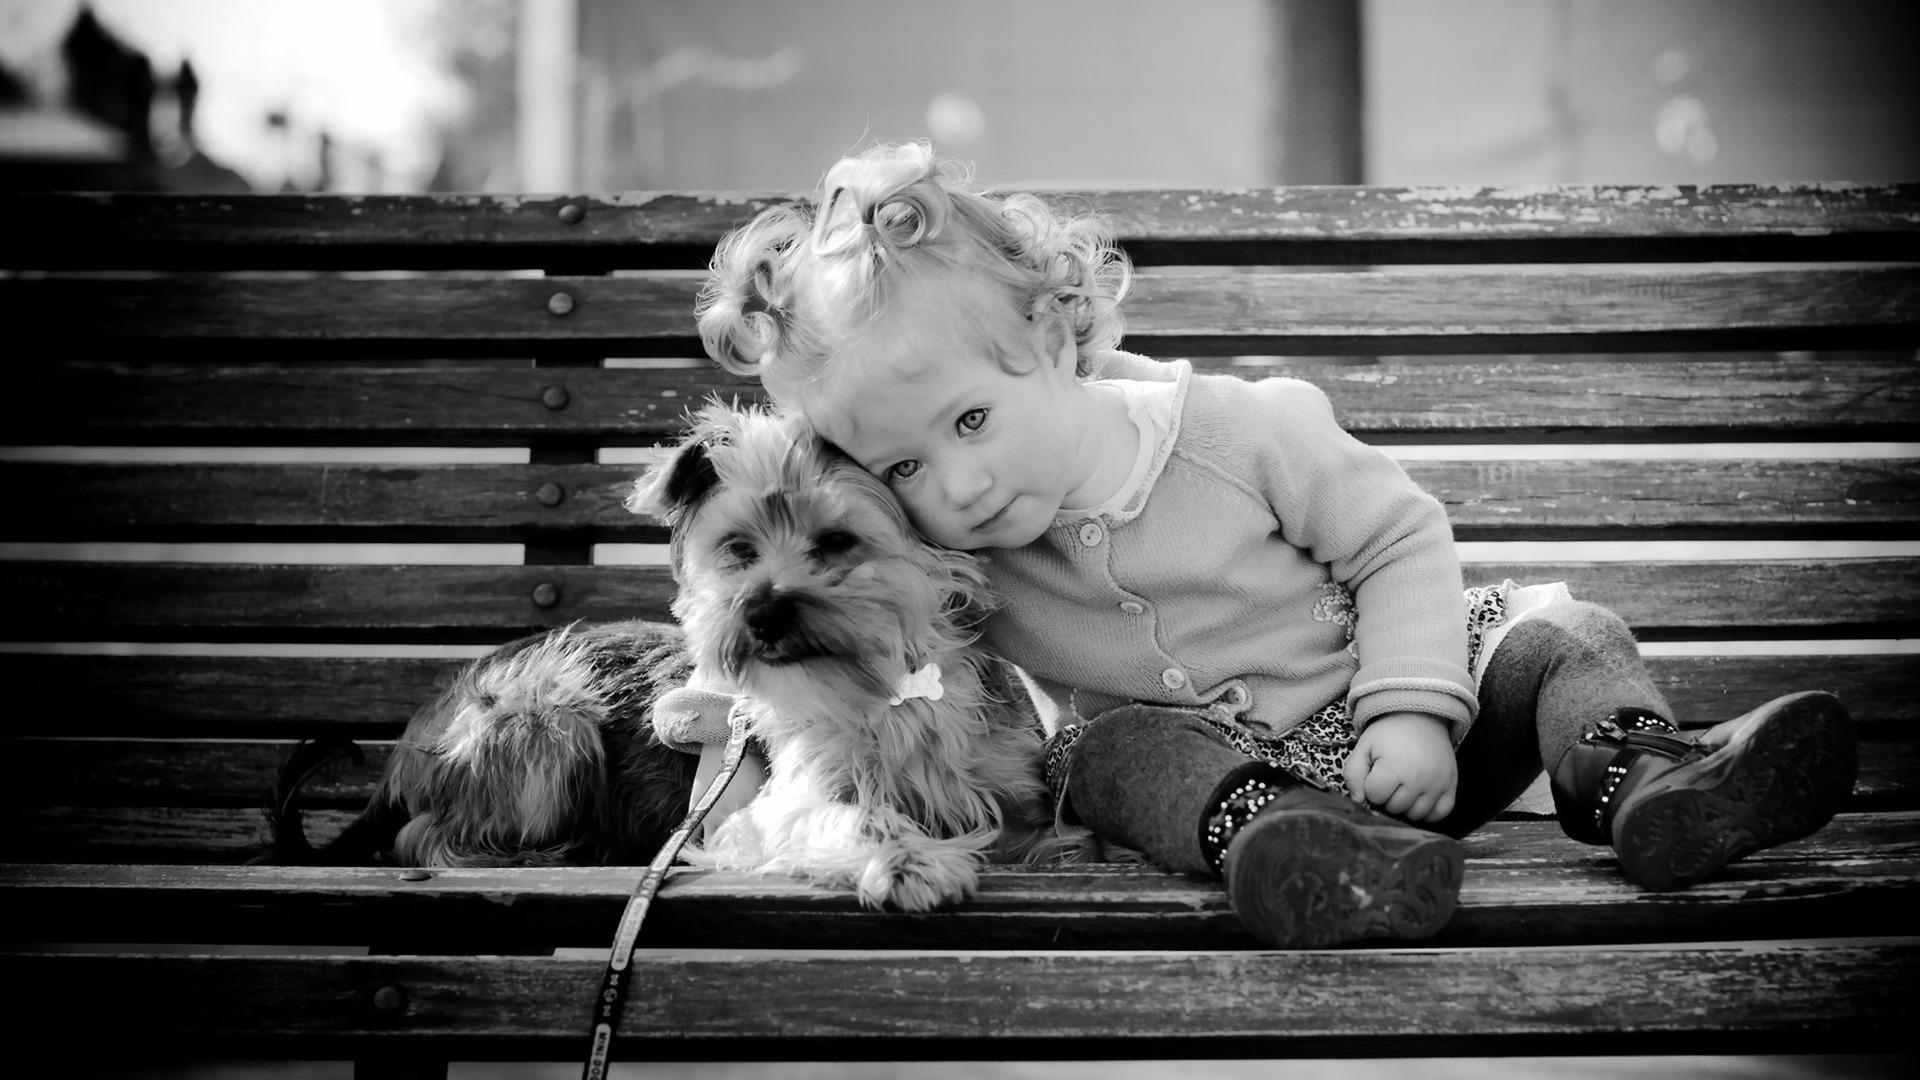 Картинка со смыслом о любви и доброте